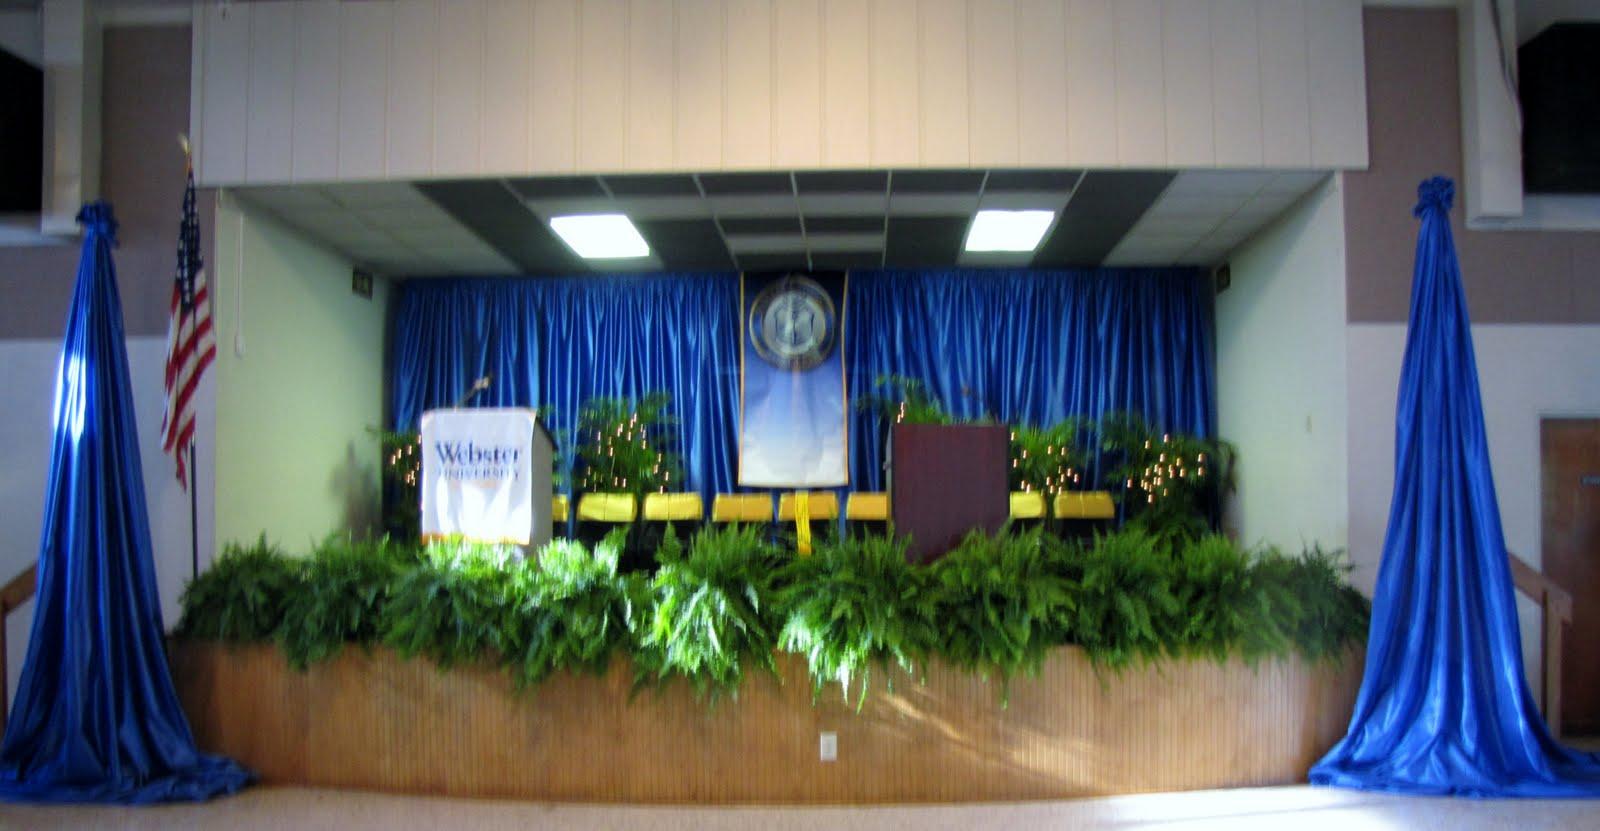 People Event Decorating Company Webster Graduation April 9 2011